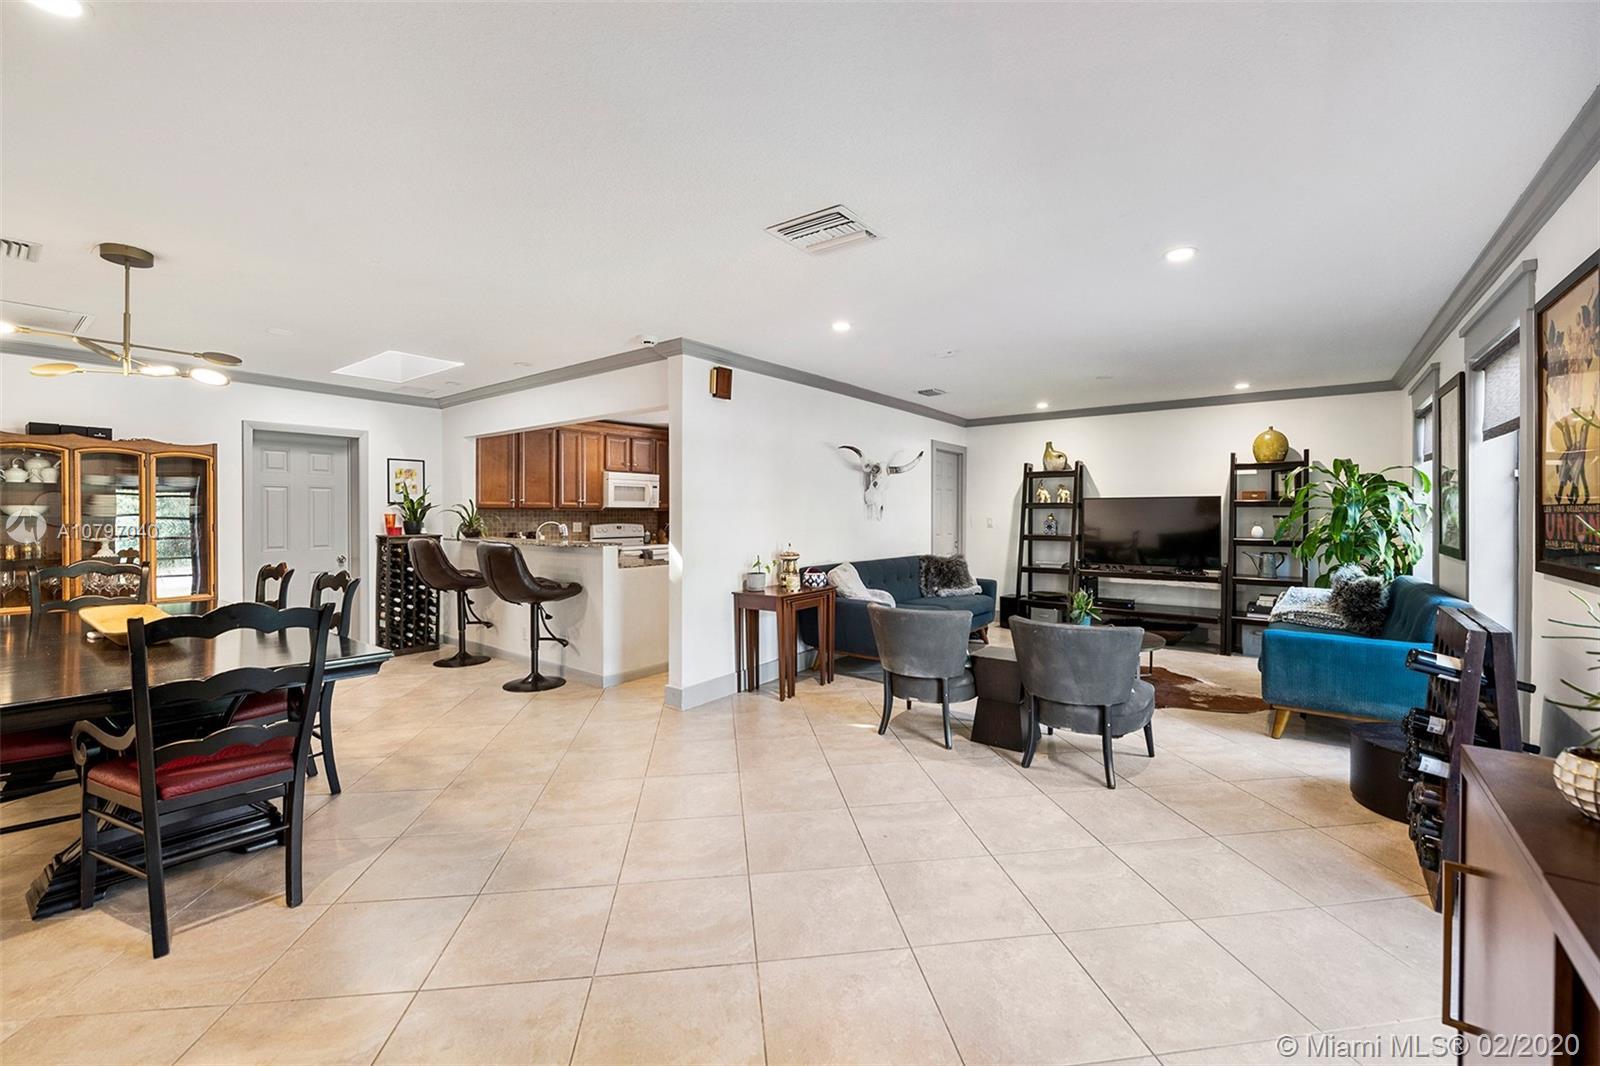 942 Johnson St, Hollywood, FL 33019